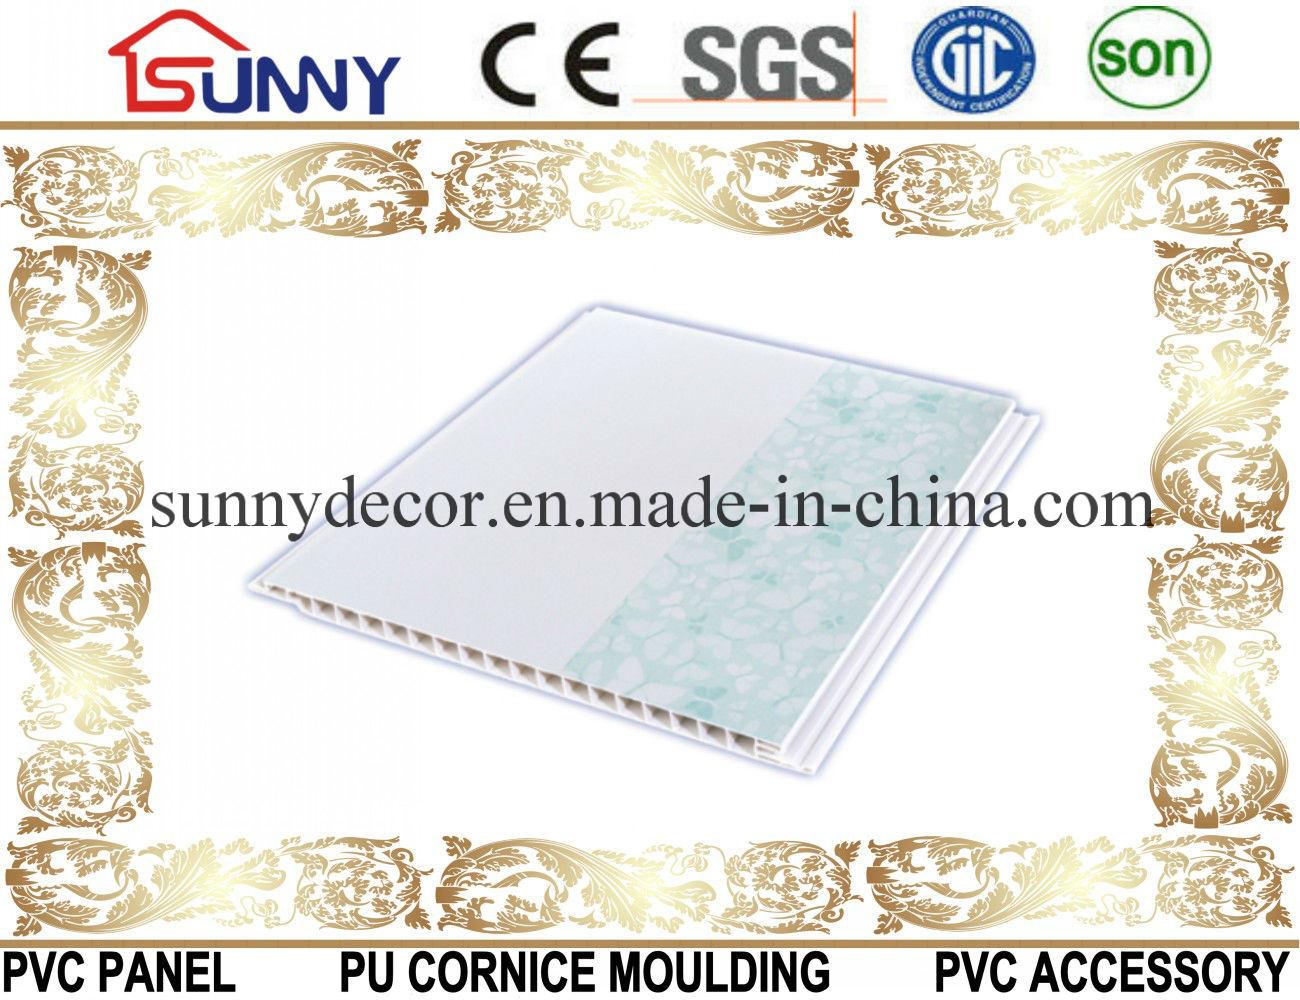 High Quality PVC Printing Panels /PVC Printing Ceiling Wall Panel Made in China